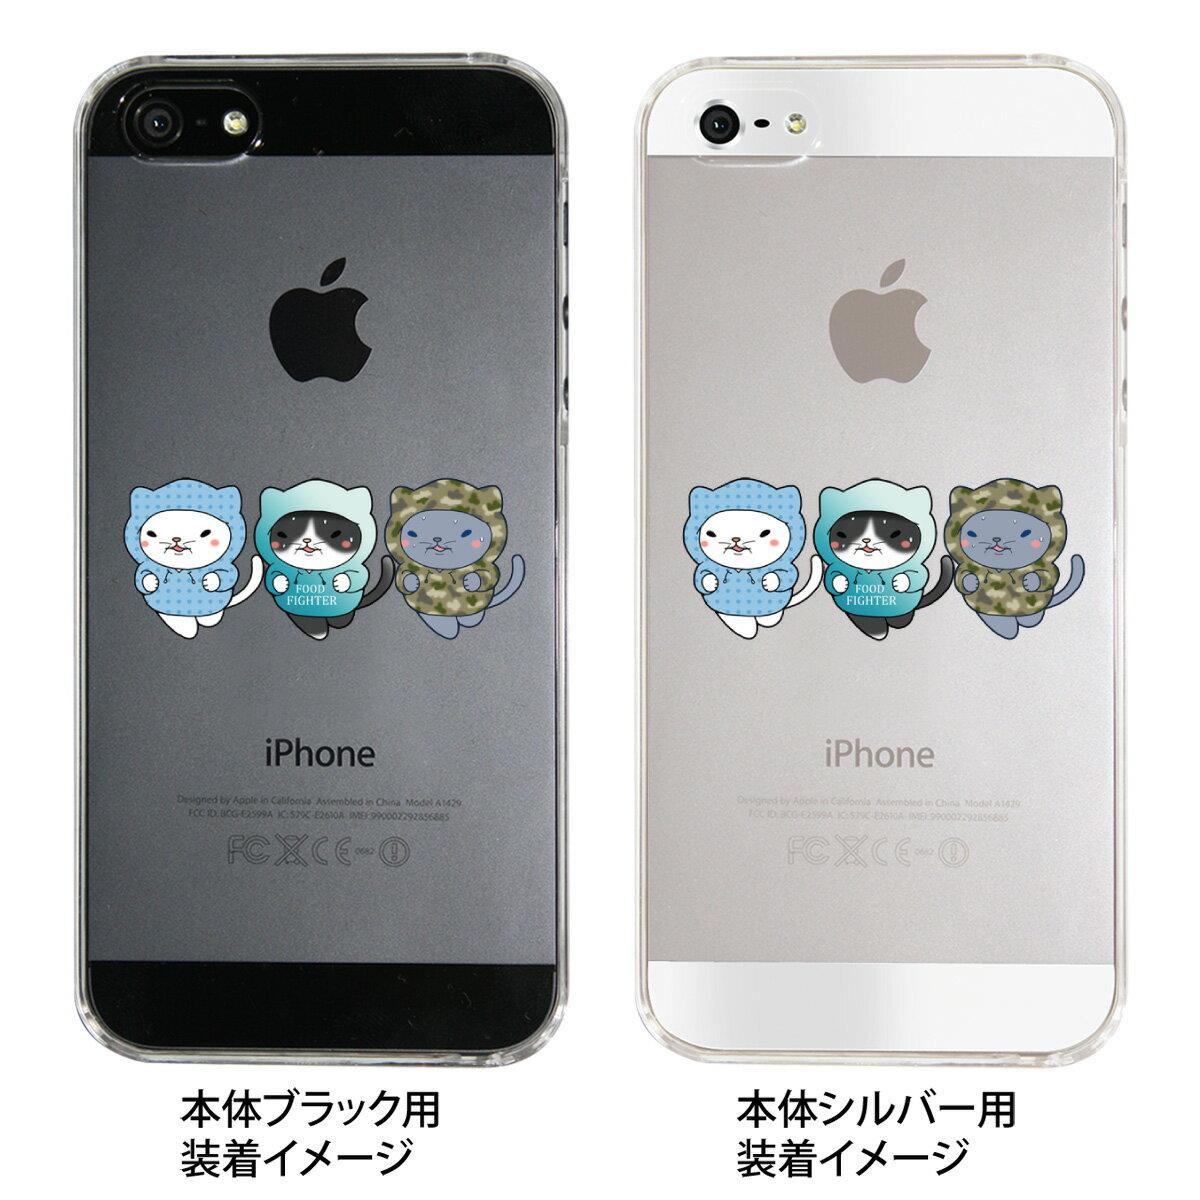 iPhone5s iPhone5 iPhone SE Clear Arts iPhone ケース カバー スマホケース クリアケース ハードケース【トレーニングねこ】【ダイエット】 26-ip5-md0028s